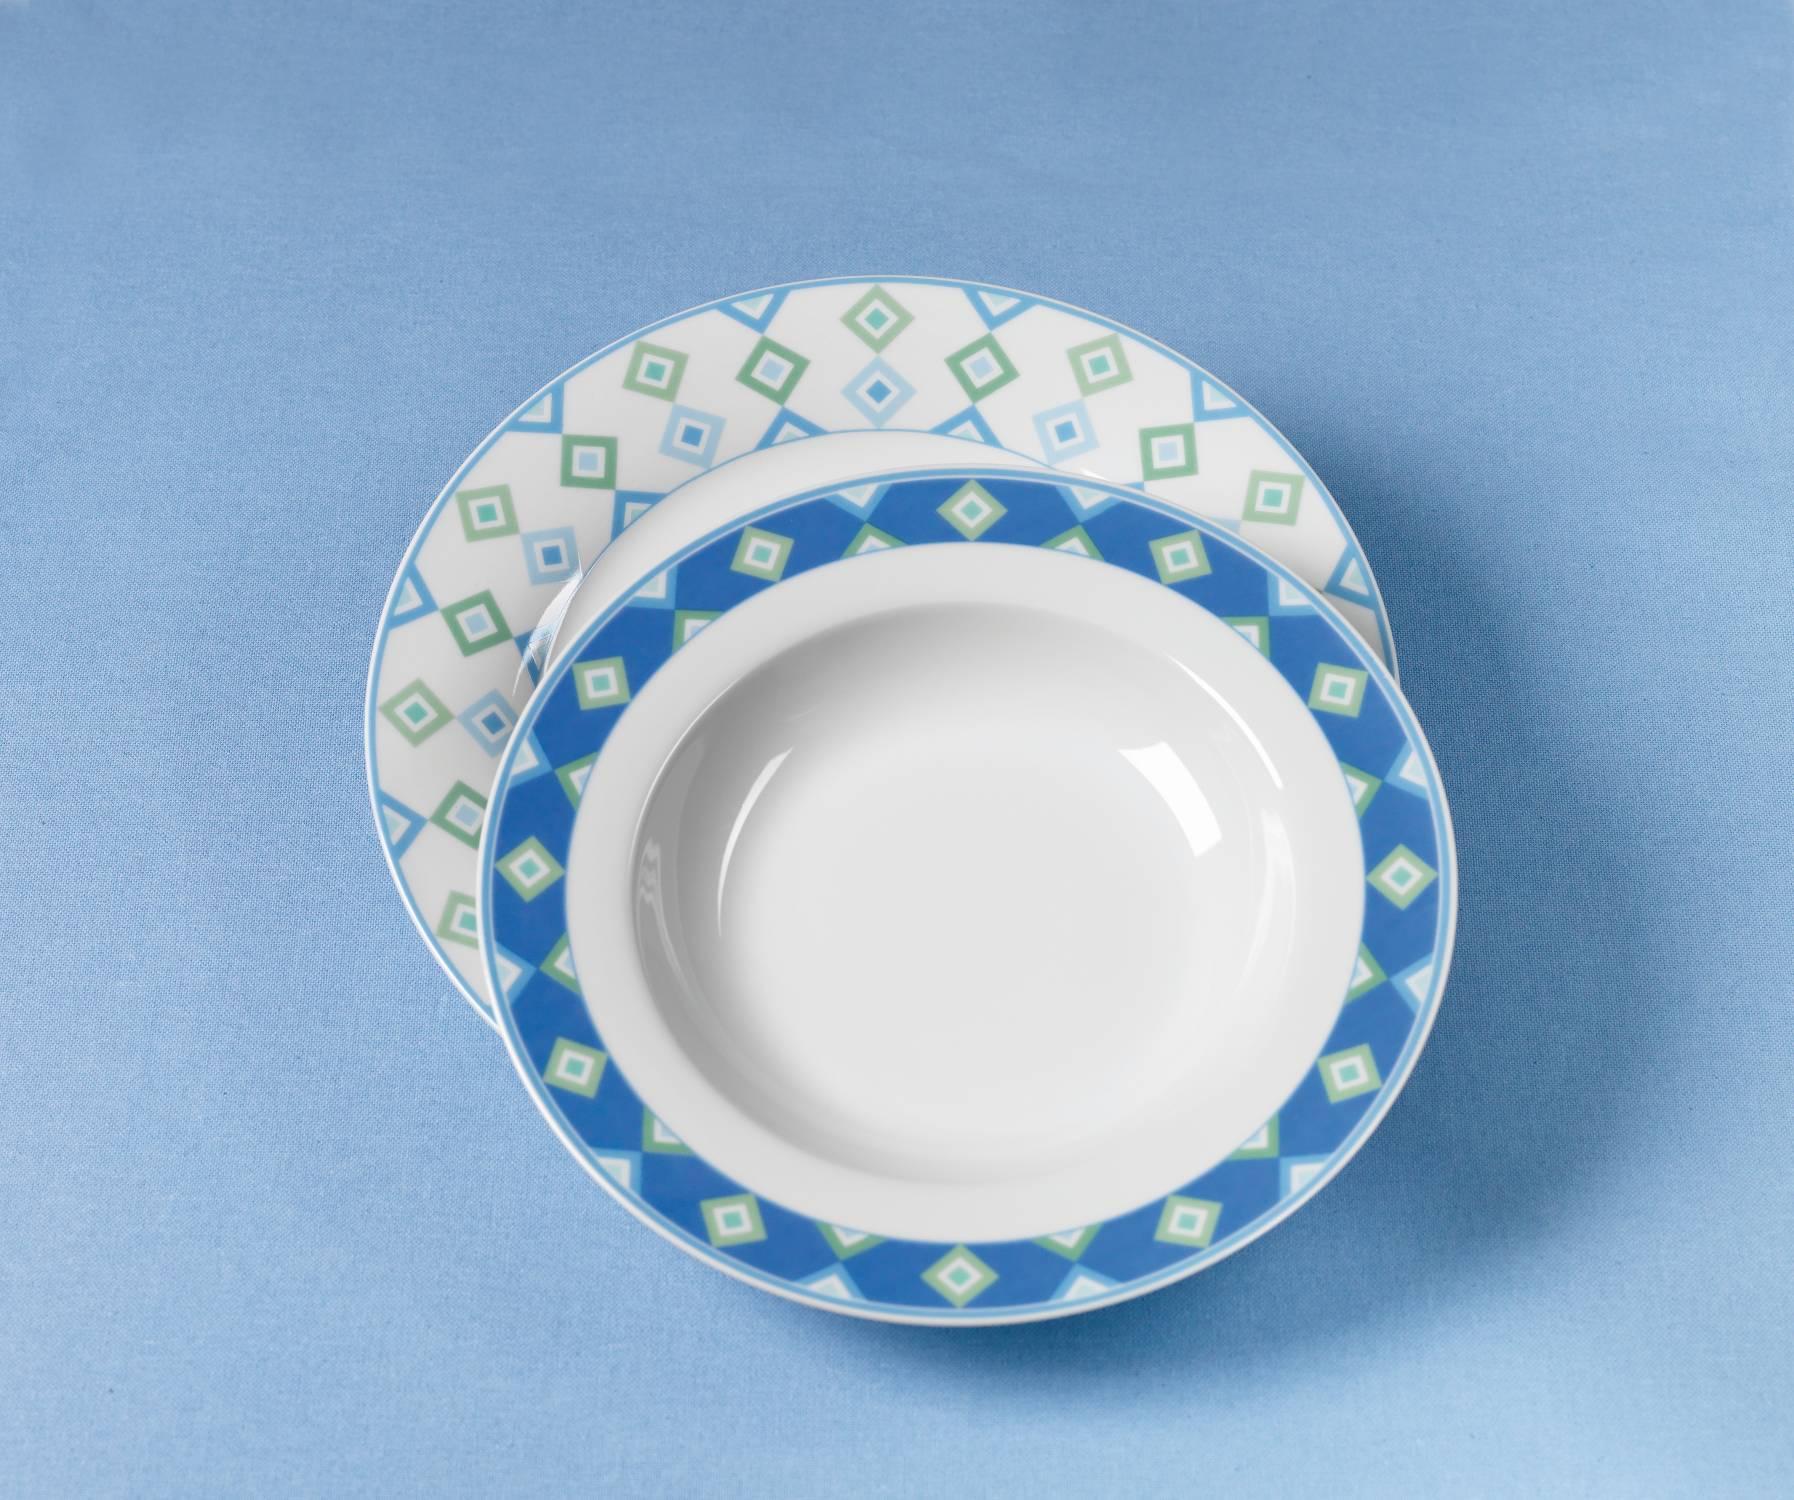 flirt porzellan ritzenhoff breker Gebrauchtes porzellan von ritzenhoff & breker / flirt finden sie in der porzellanbörse alteserien.